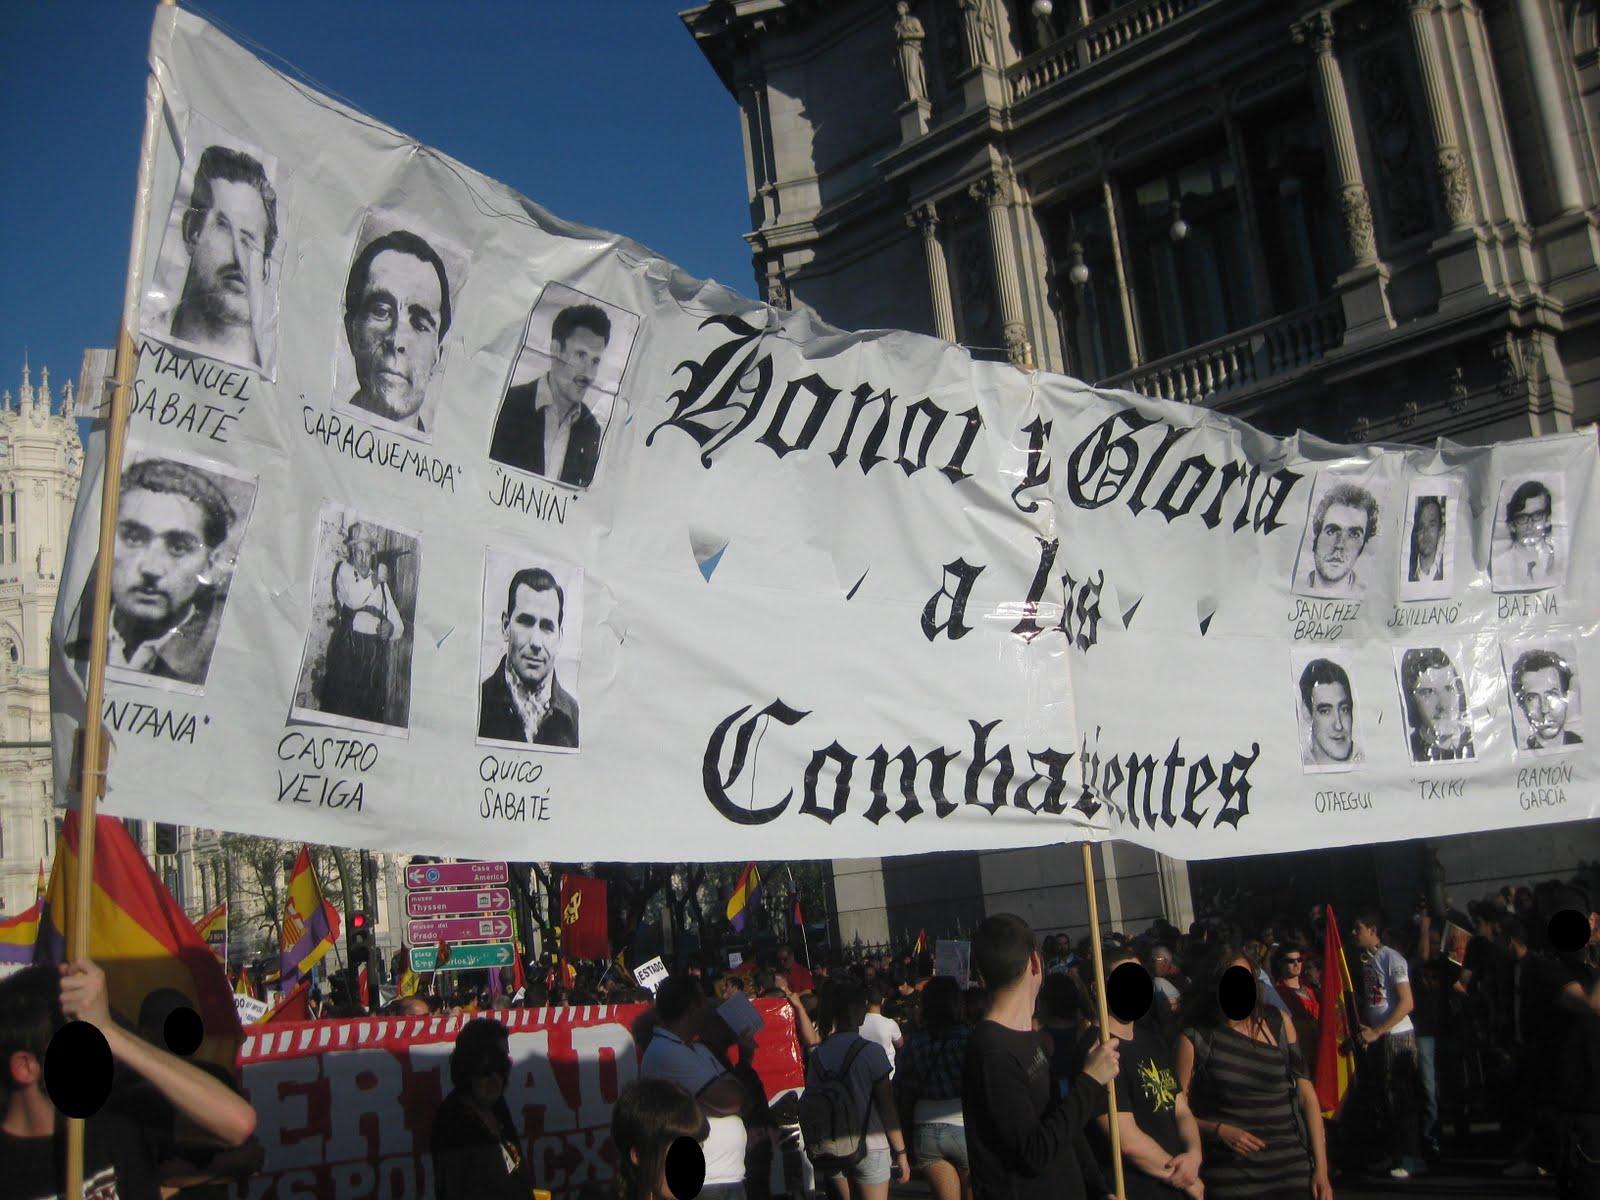 Reconstrucción Comunista ¿qué os parecen? 1